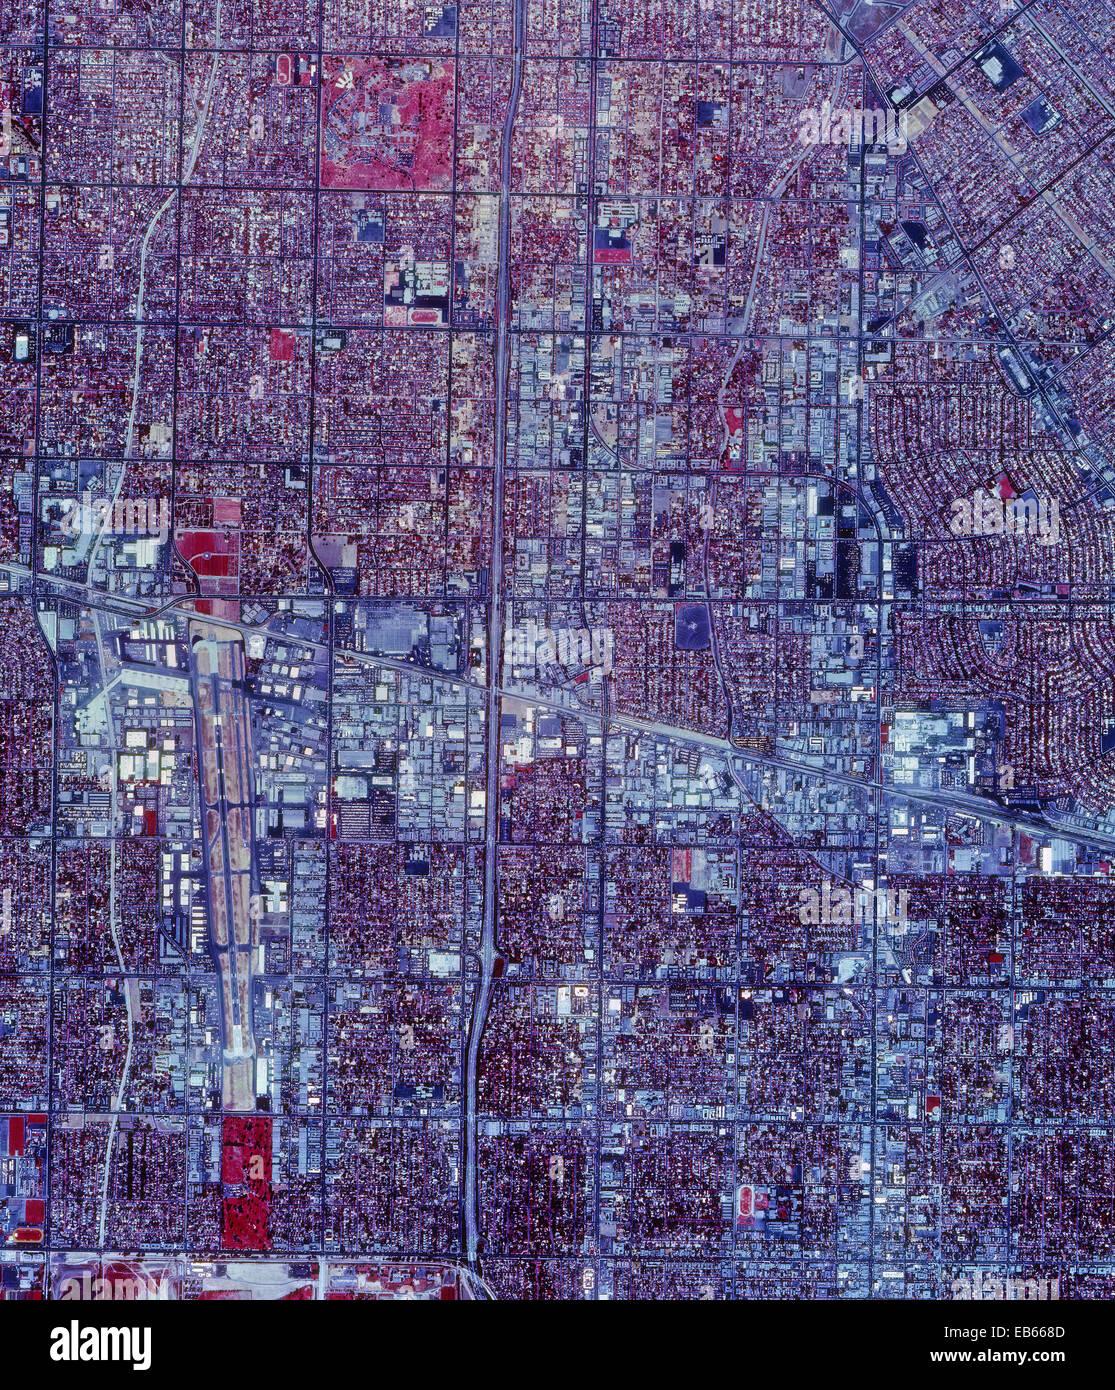 Histórica fotografía aérea infrarroja de Van Nuys, California, 1989 Imagen De Stock